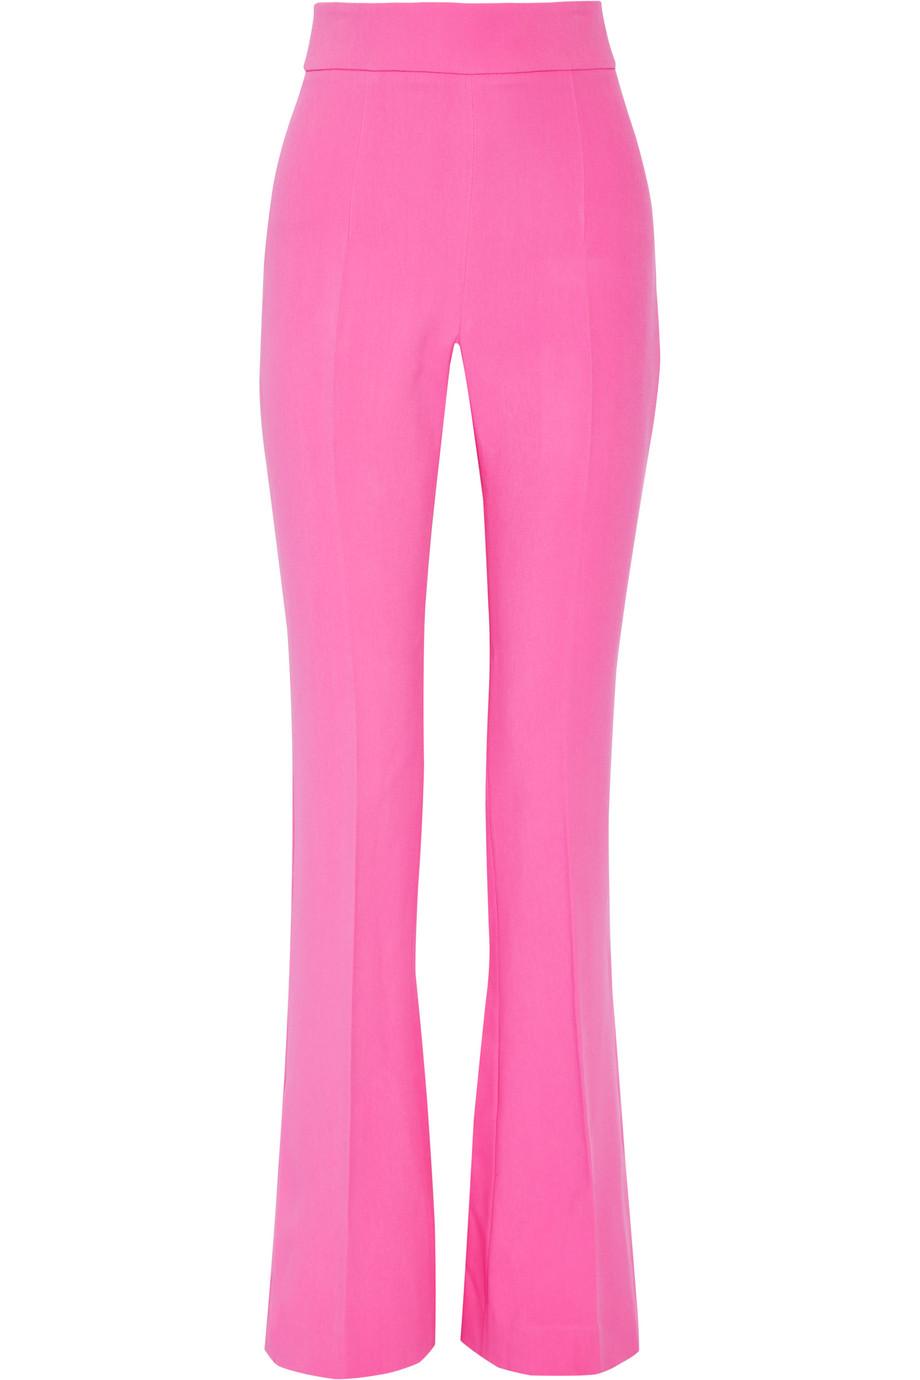 Cushnie Et Ochs Stretch-Cady Flared Pants, Pink, Women's, Size: 4